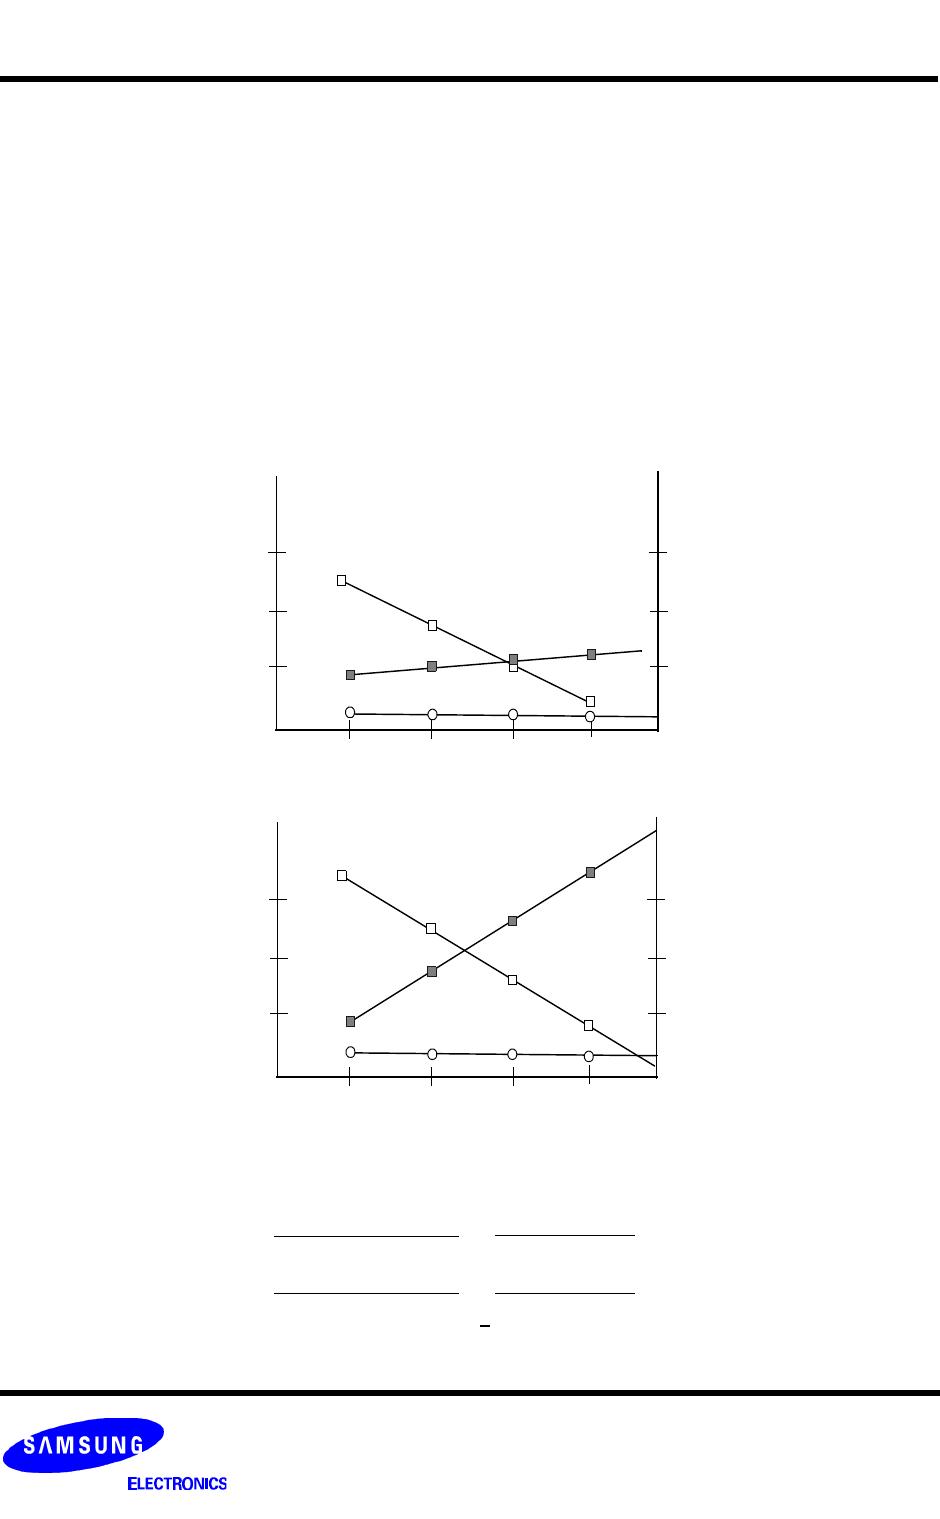 �9��yl$yi����il�f�X�_vol(max.) iol + ∑il  = 3.2v 8ma+ ∑il rp(min, 2.